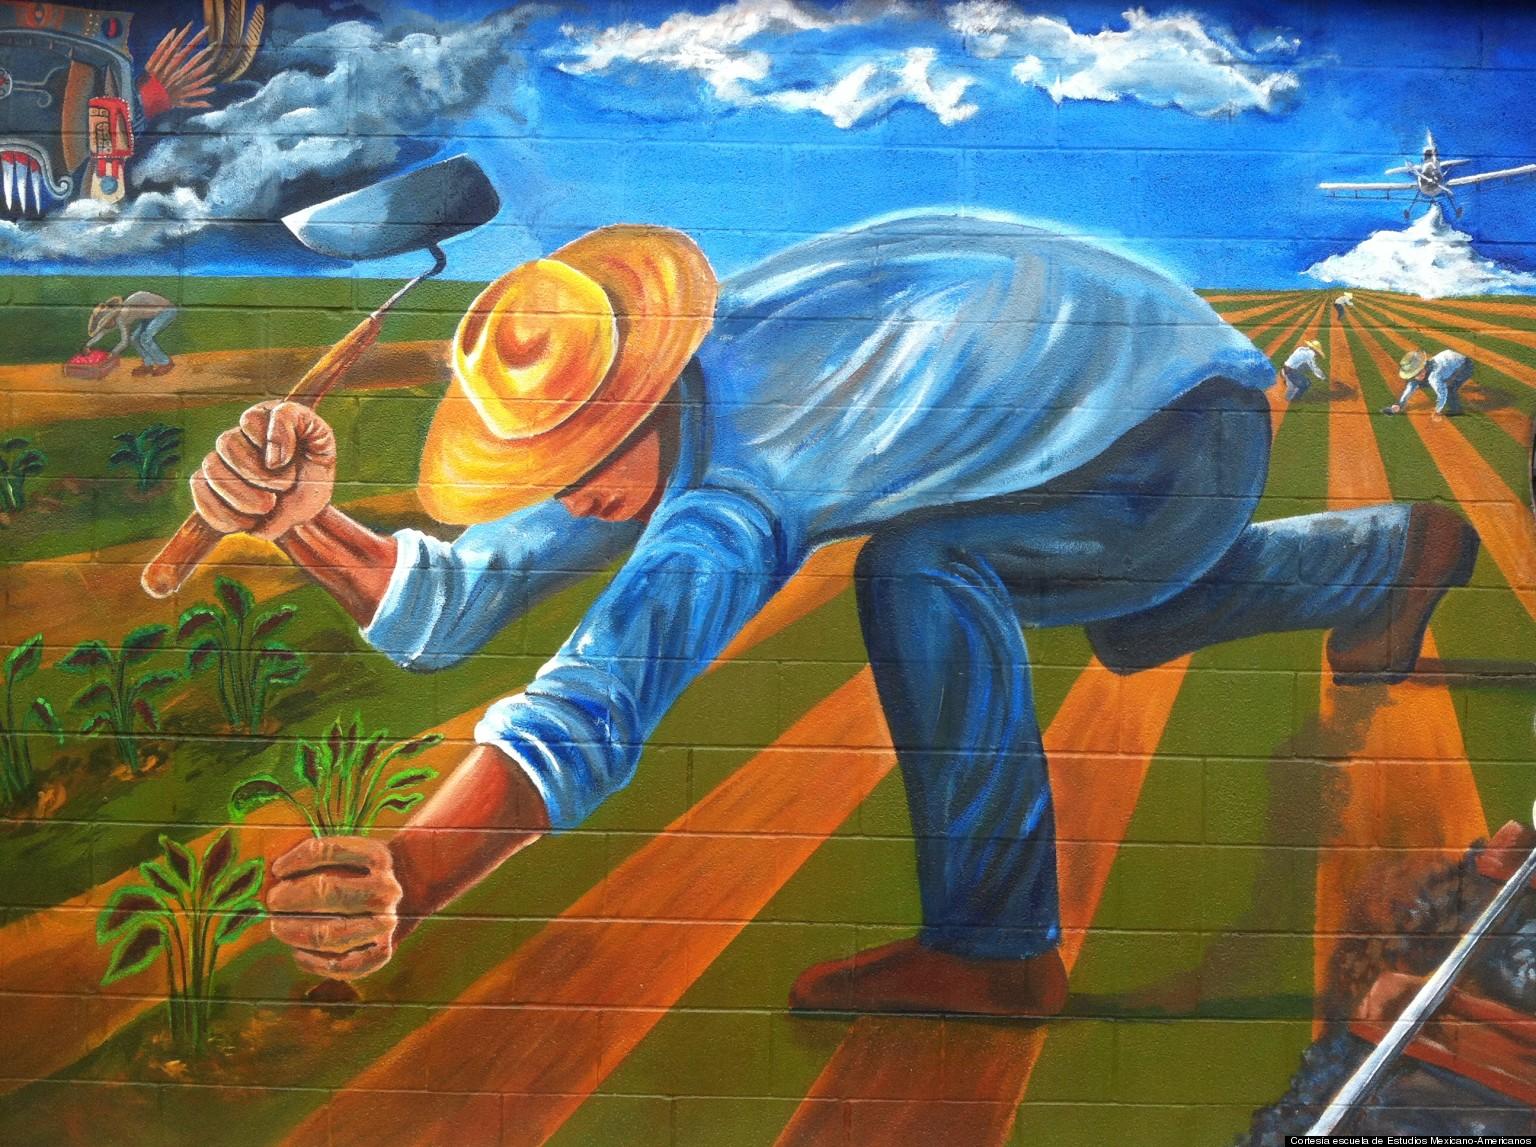 Mural para honrar labor de braceros en texas huffpost for Mural una familia chicana